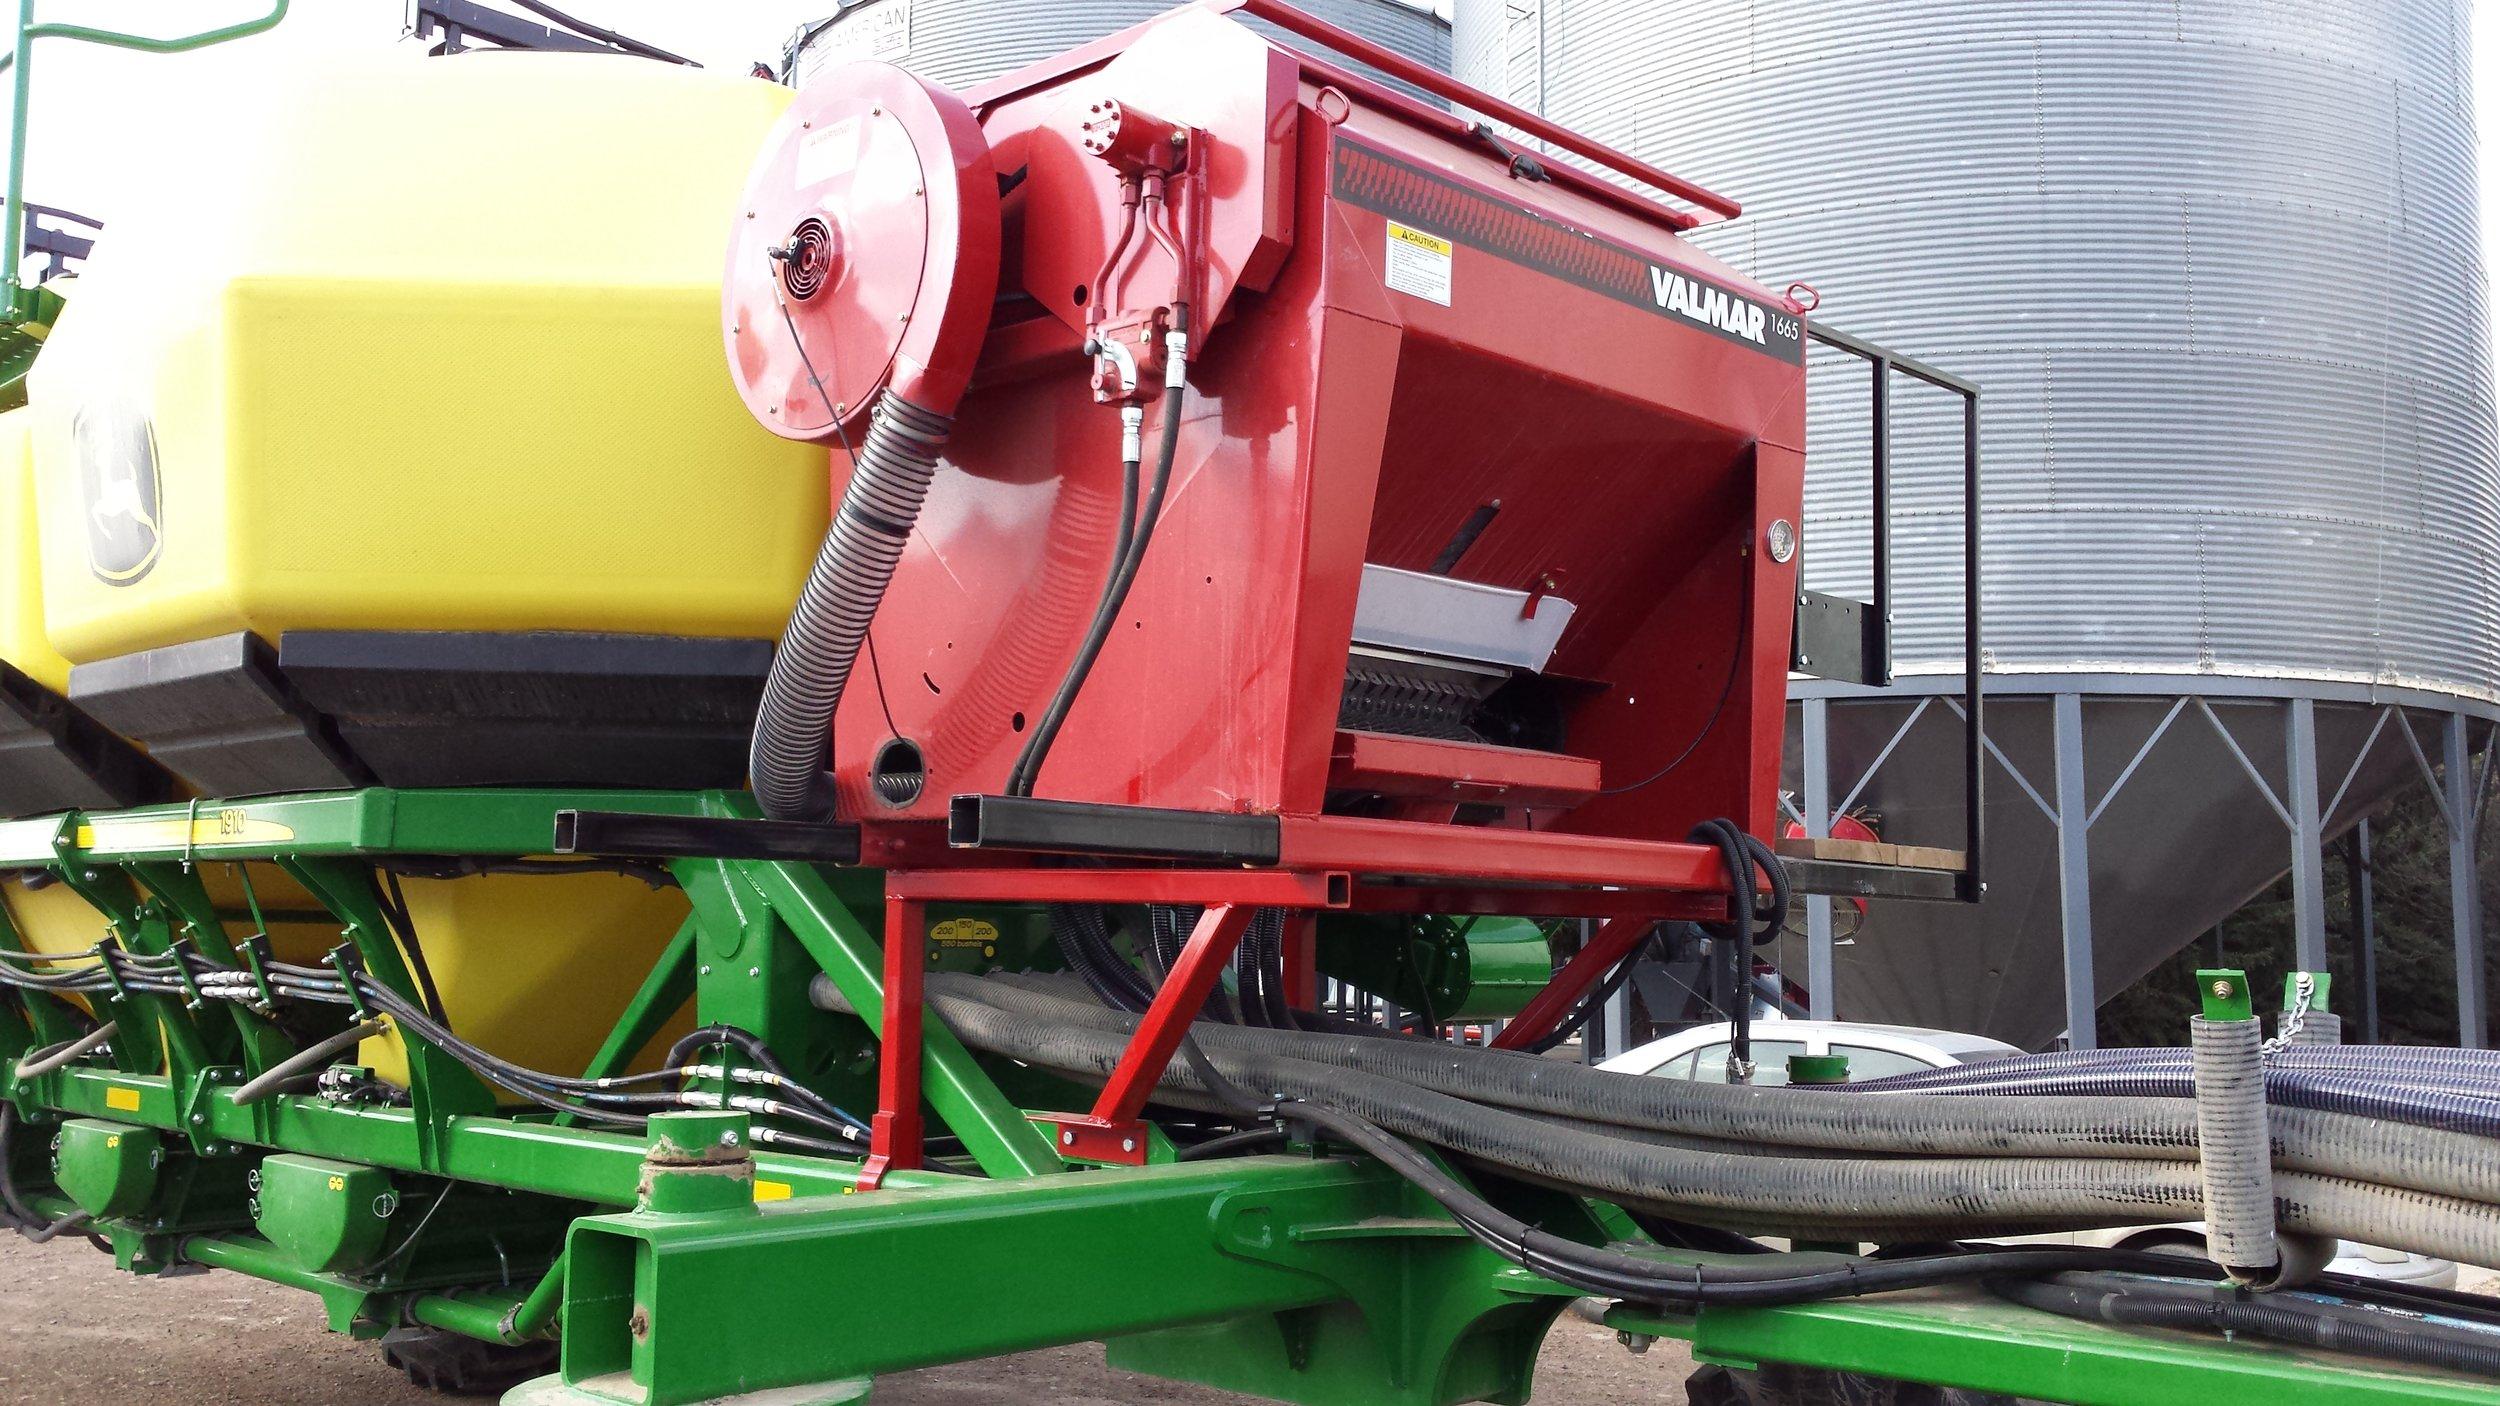 Valmar 1665 Row-Crop Applicator and Inter-Row Seeder